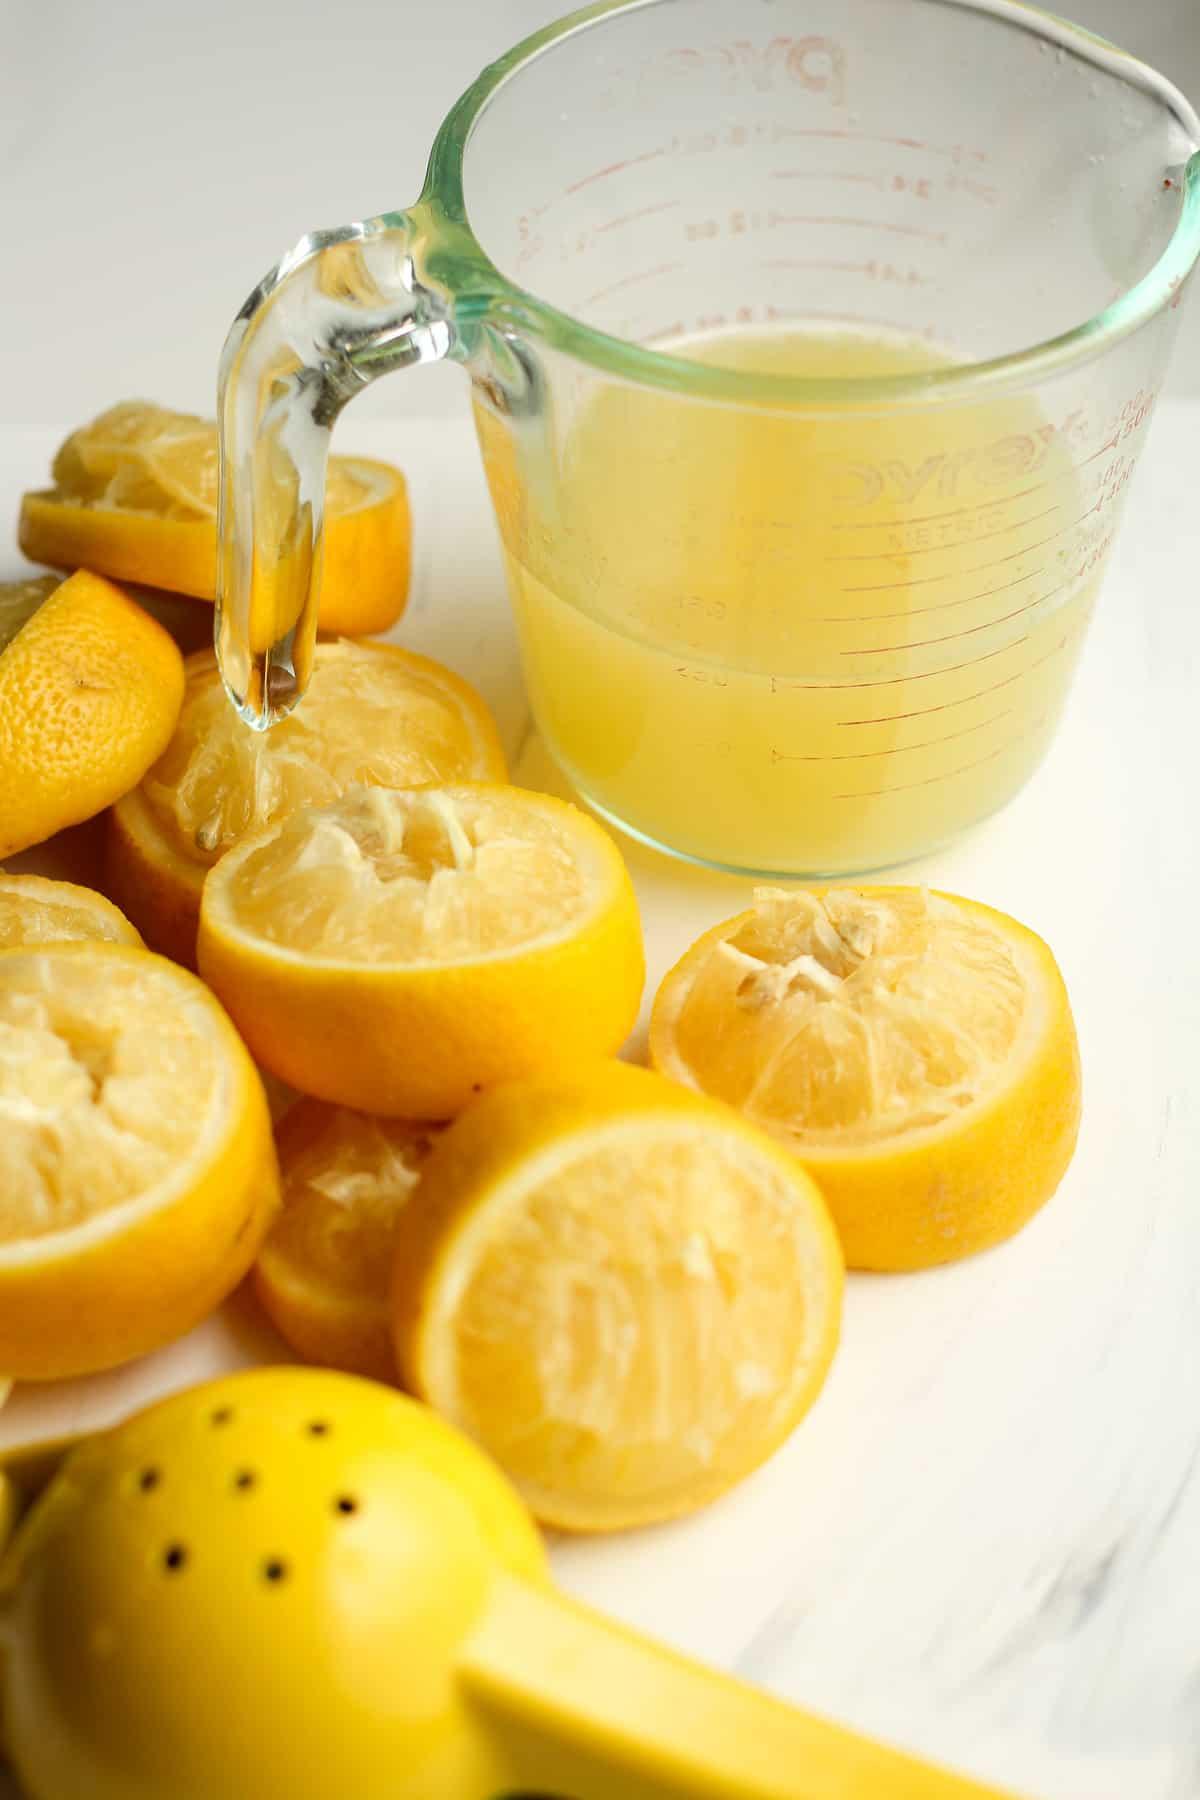 Side shot of lemon juice with 1/2 lemons just squeezed.